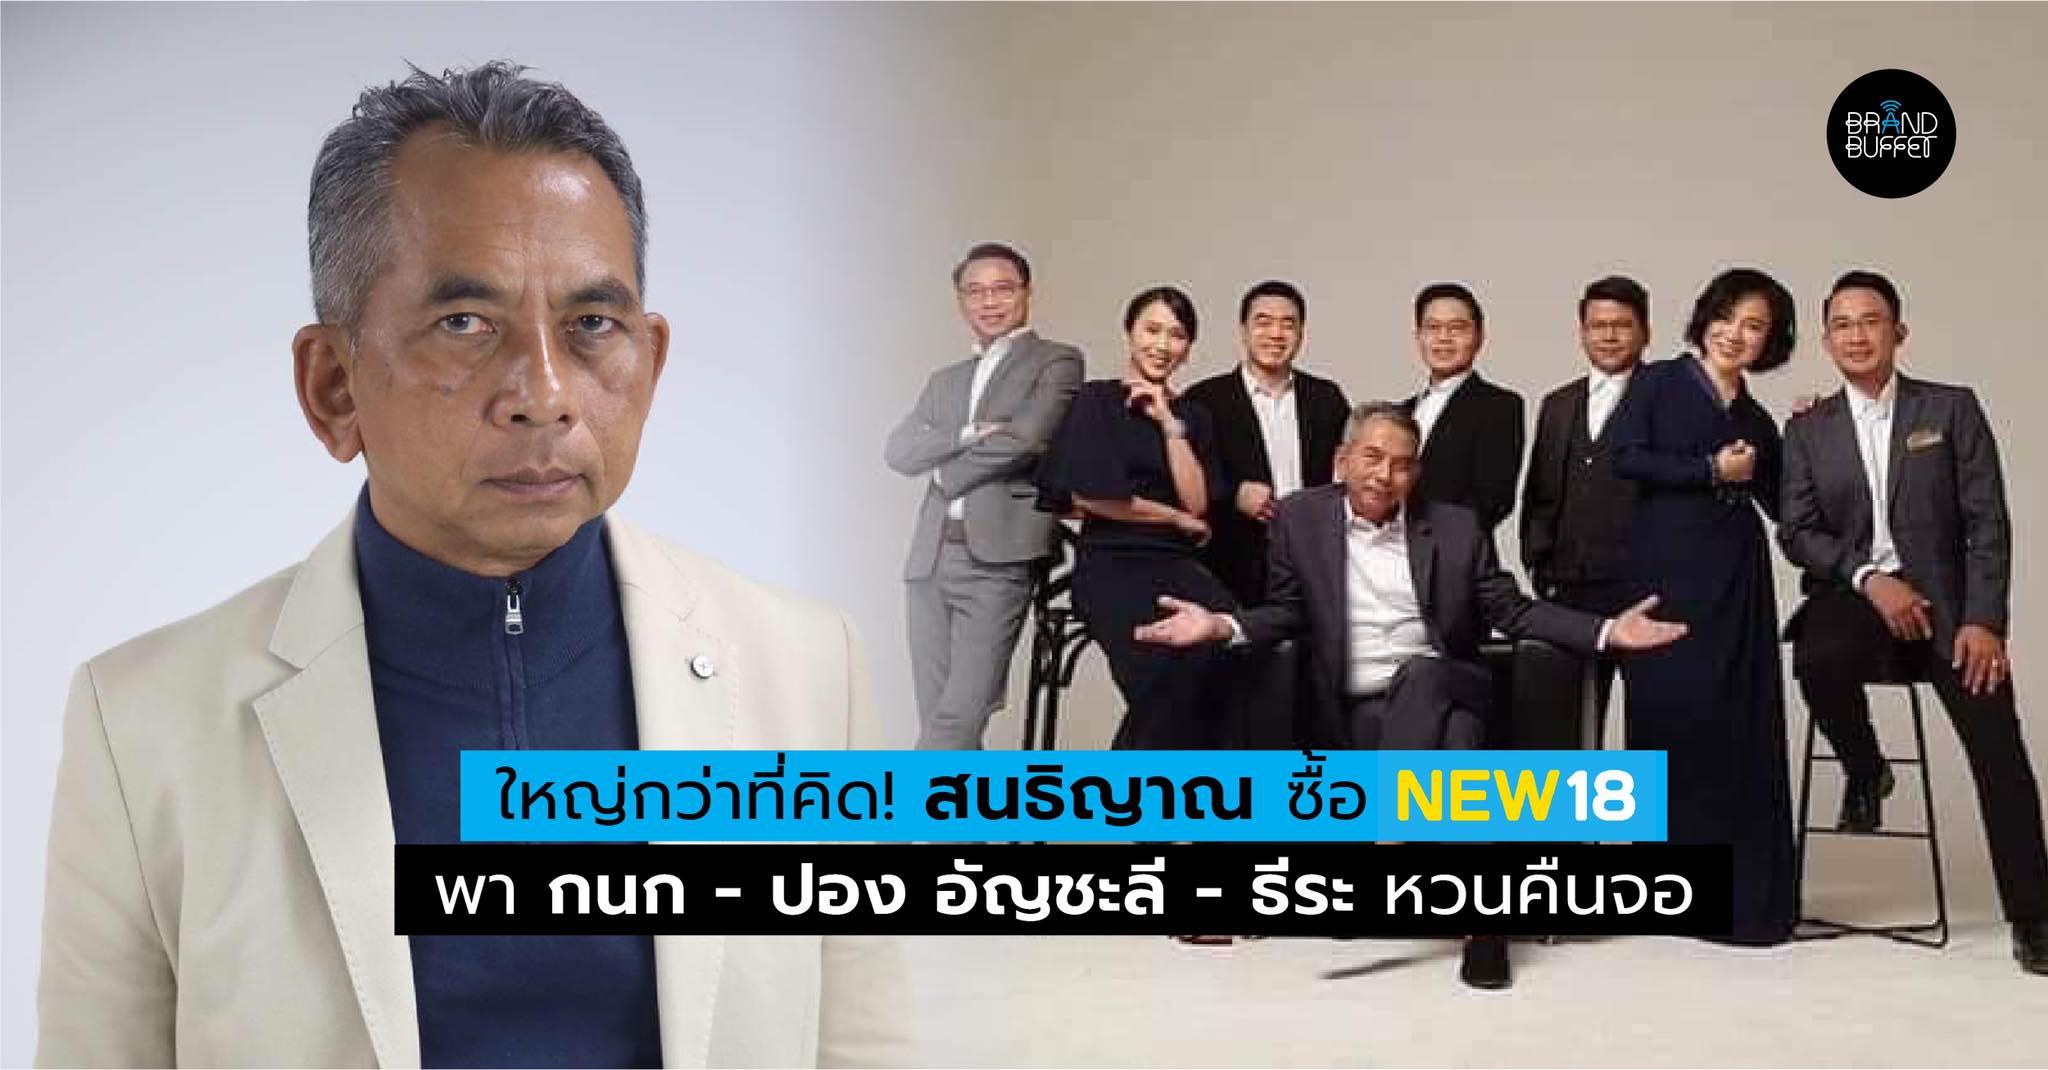 sonthiyan new tv สนธิญาณ ซื้อ นิวทีวี